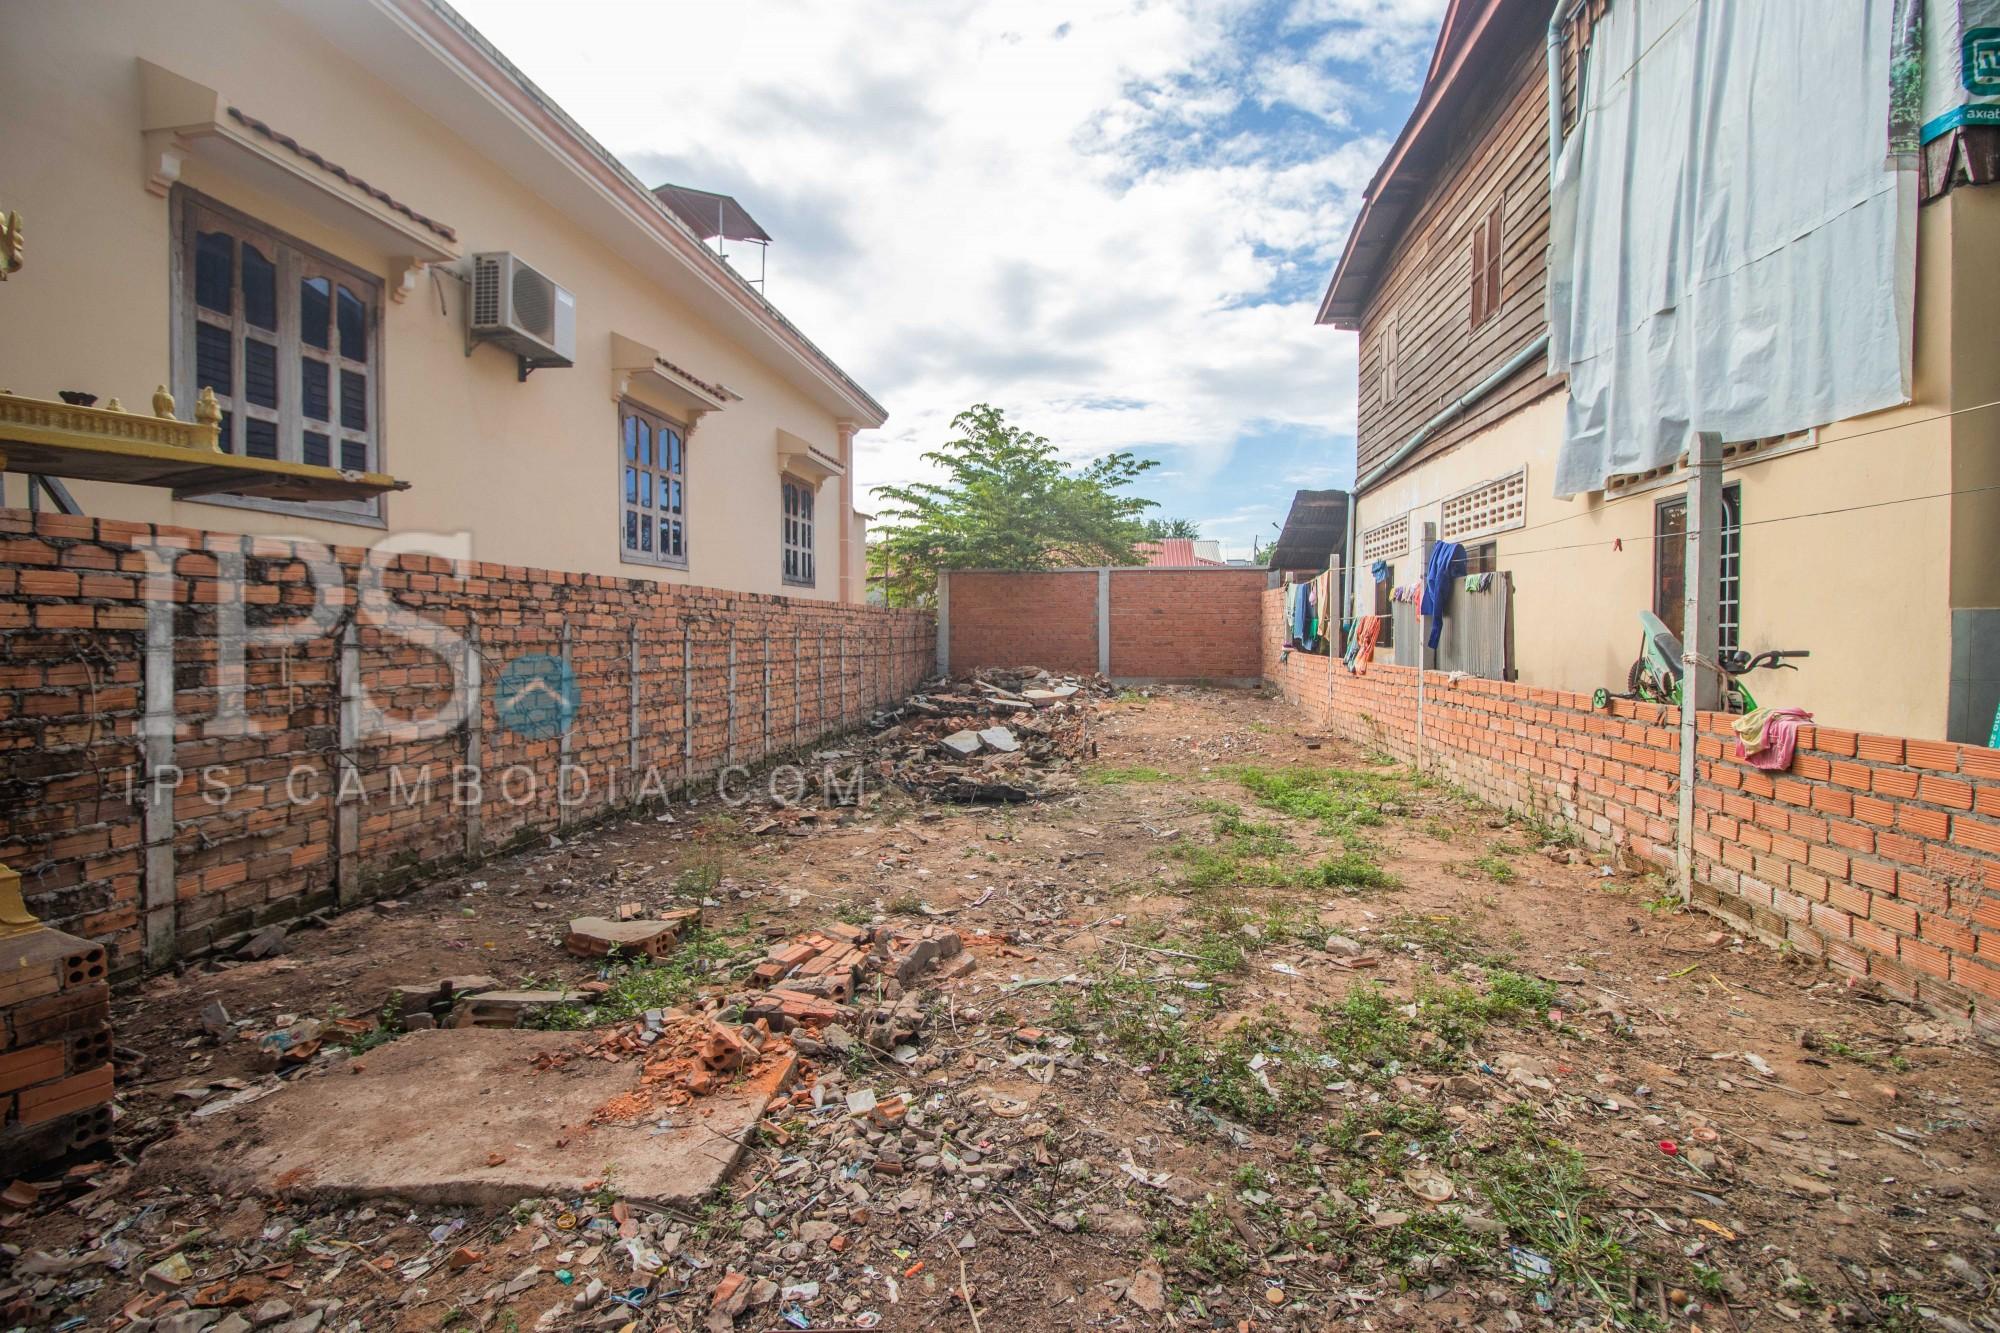 98 Sqm Residential Land For Sale - Wat Bo, Siem Reap